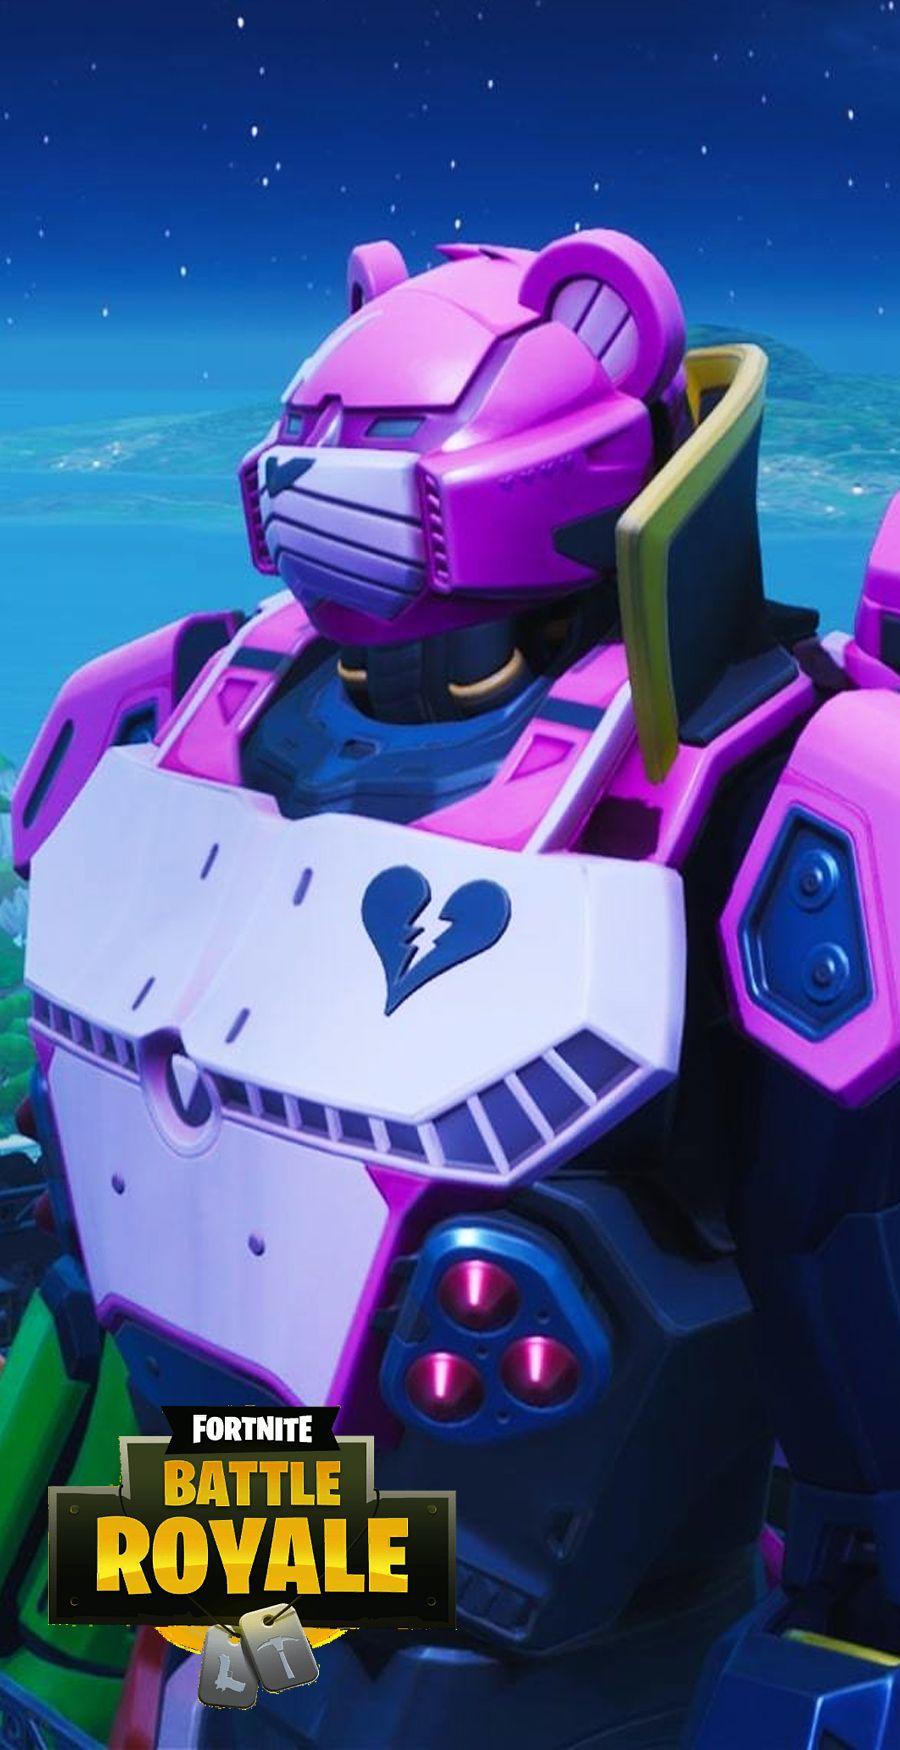 Fortnite Wallpaper Season 10 Giant Pink Bear Robot Papeis De Parede De Jogos Fortnite Papeis De Parede